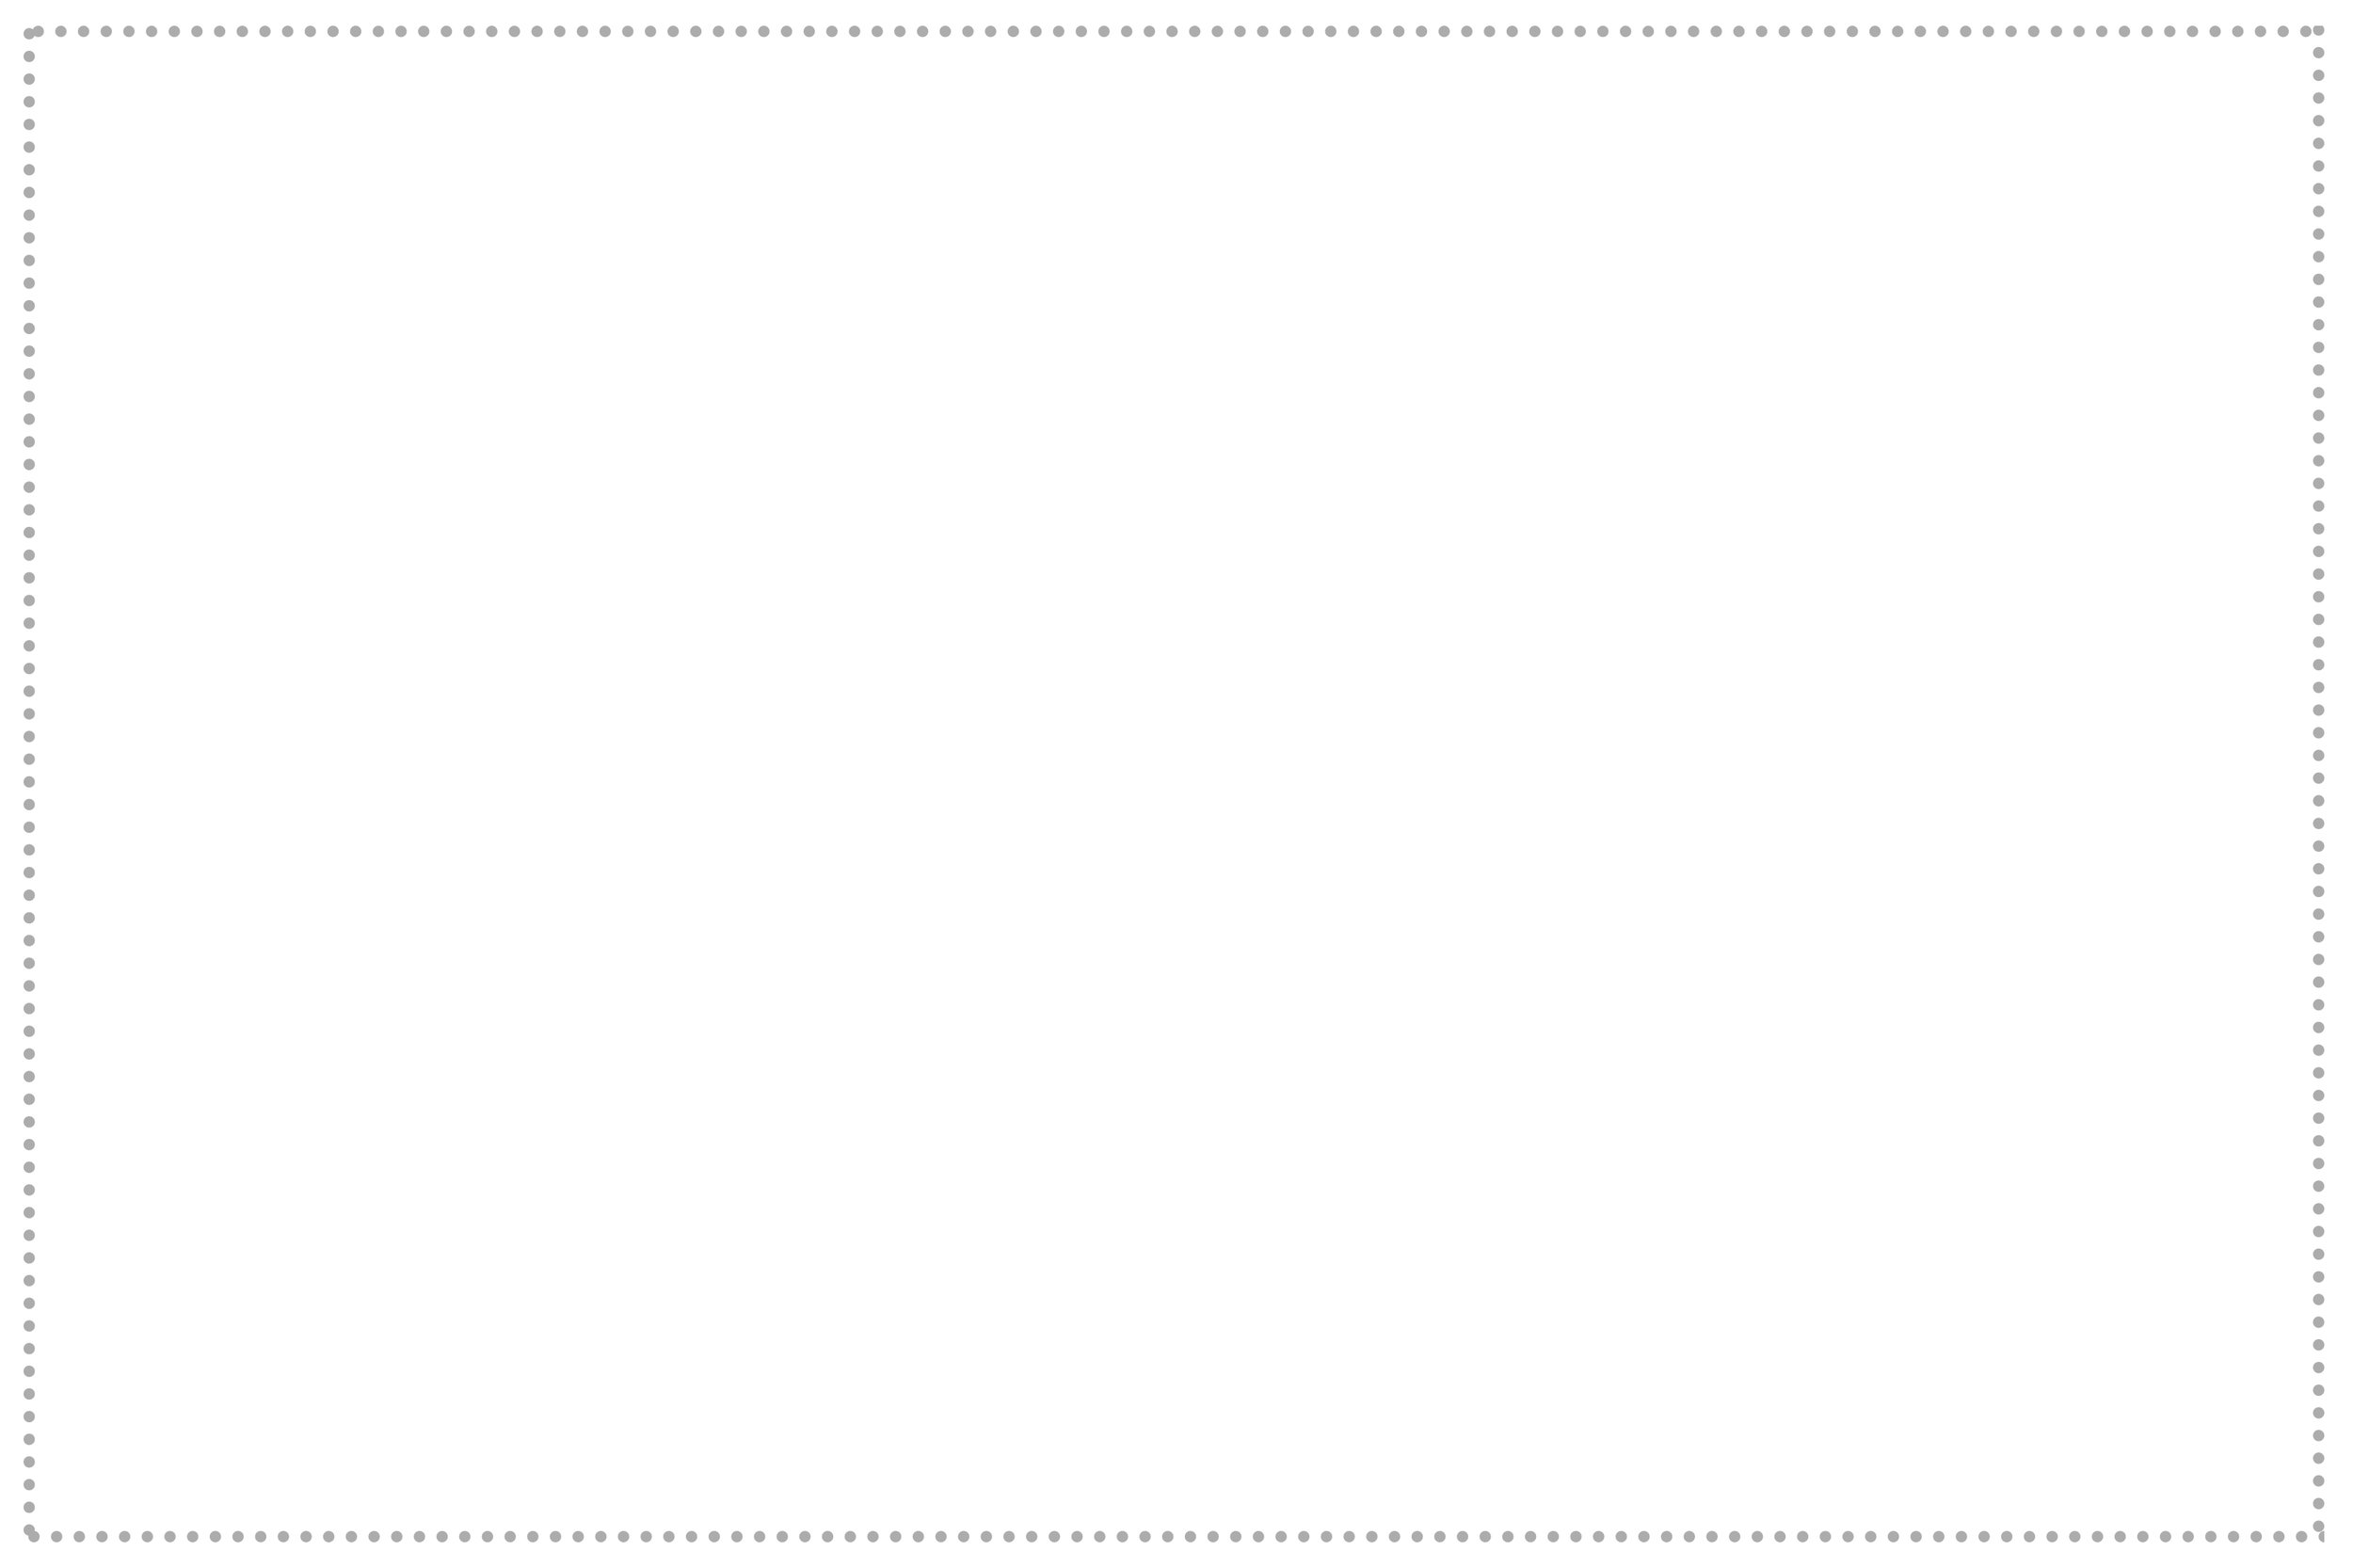 "Package 10 - £380 (Mon-Fri), £410 (Weekend & Bank holidays) - - 10 digital files- 1 unframed 11"" x 14"" print"